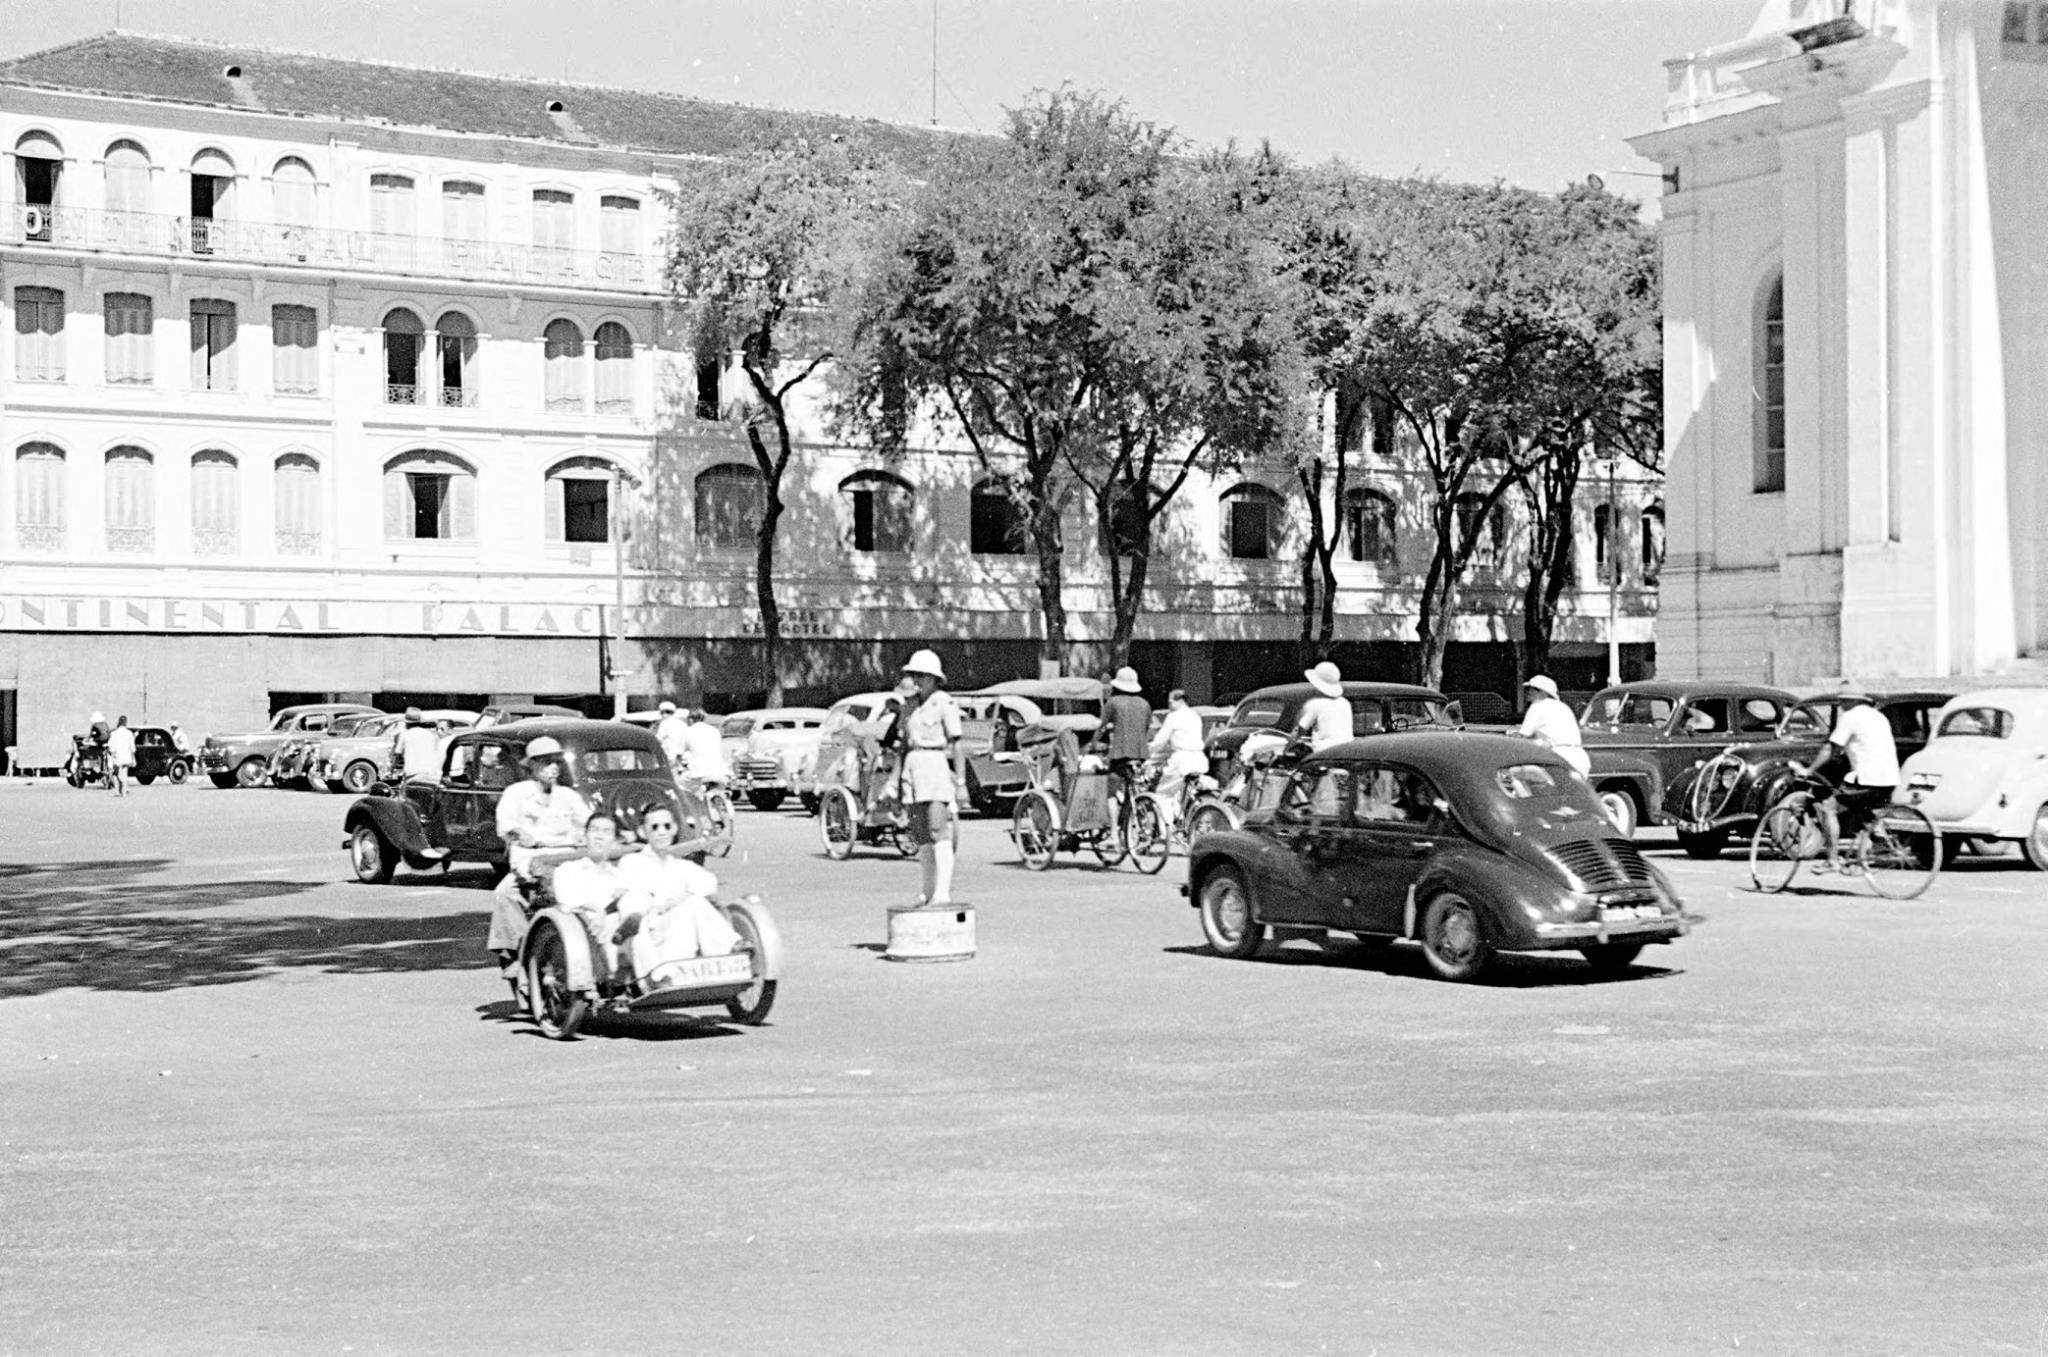 Continental Palace 1950